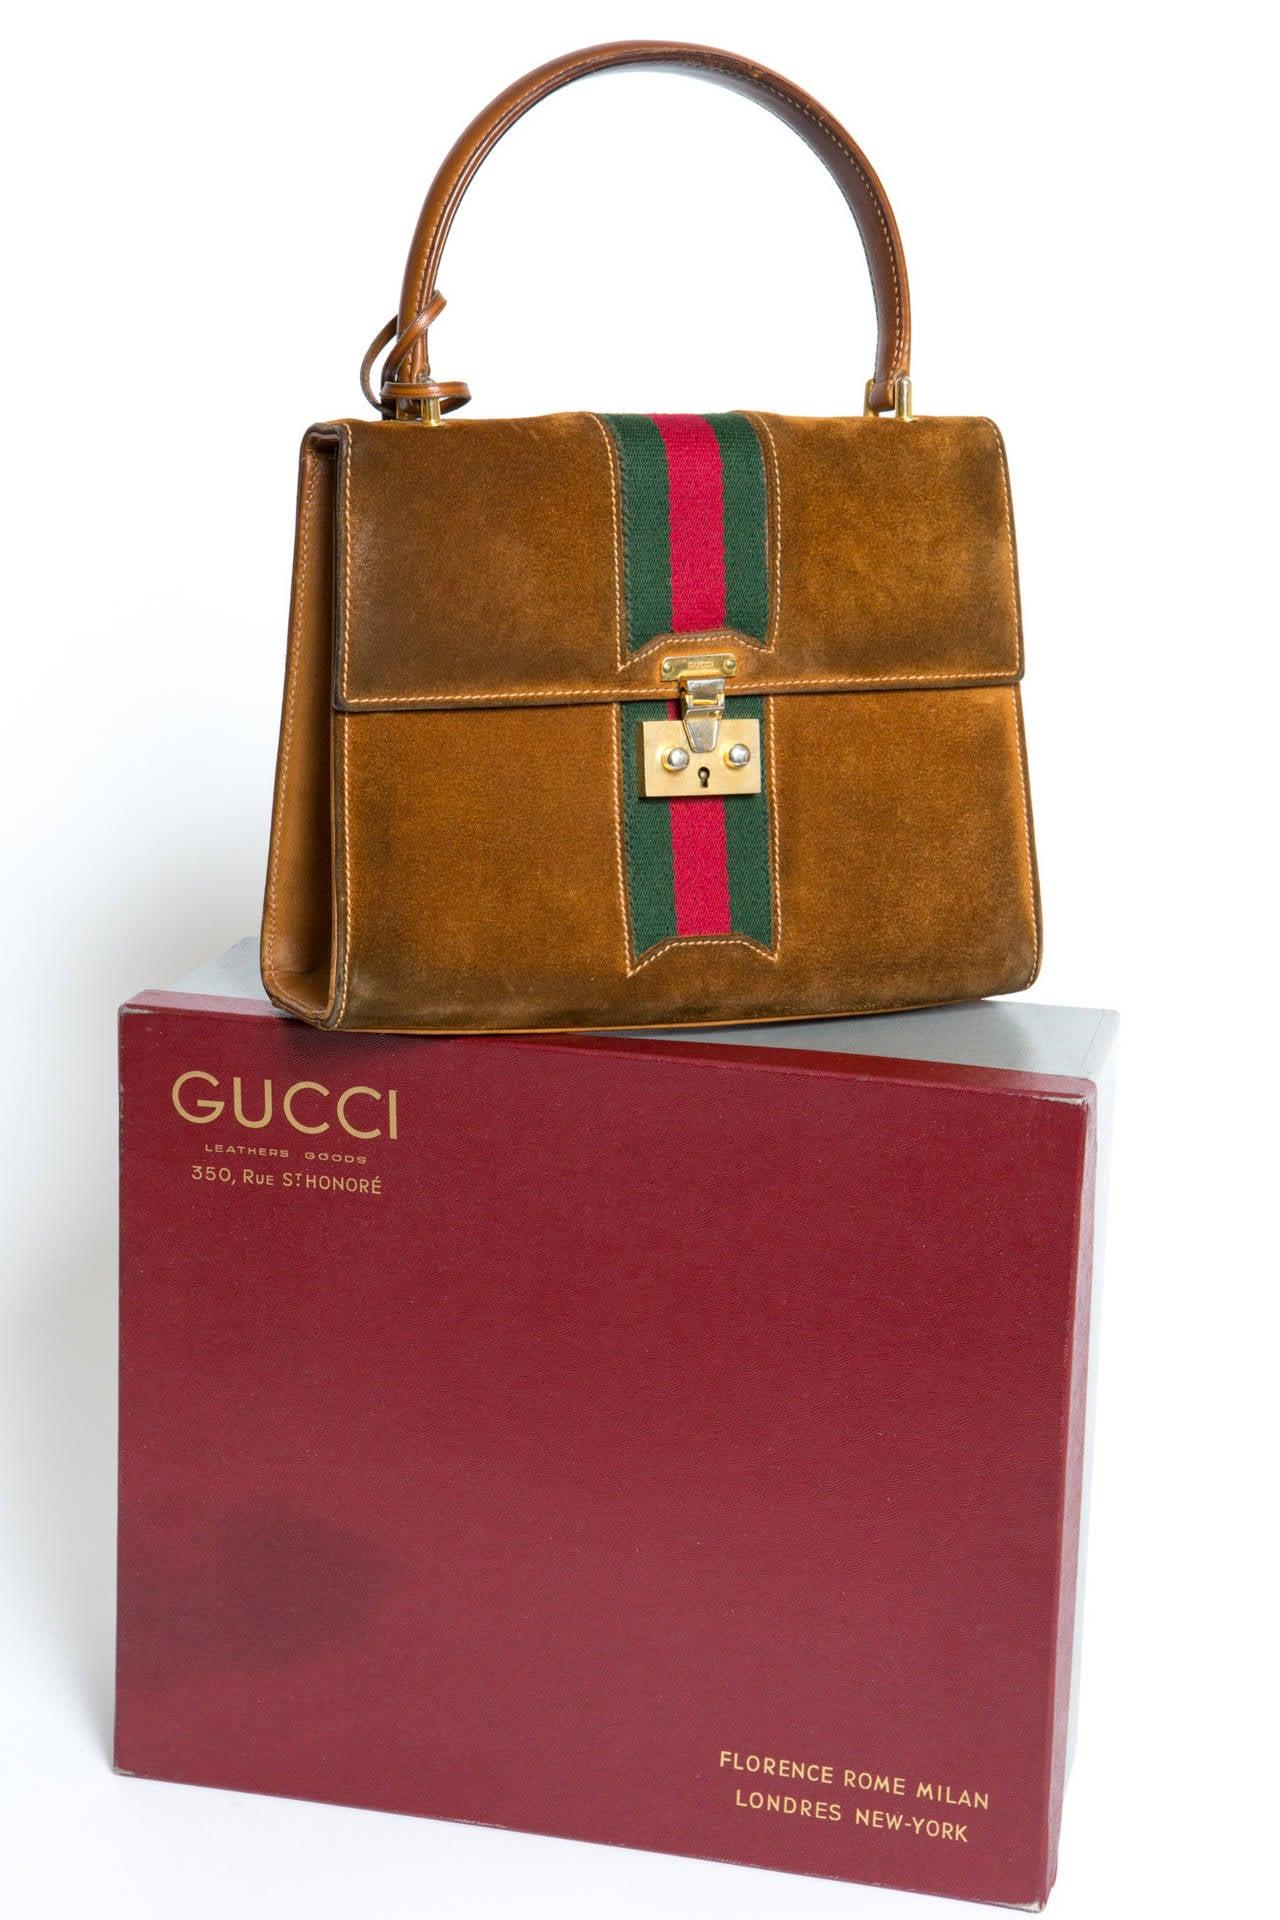 1970s Rare Gucci Camel Bag For Sale 1